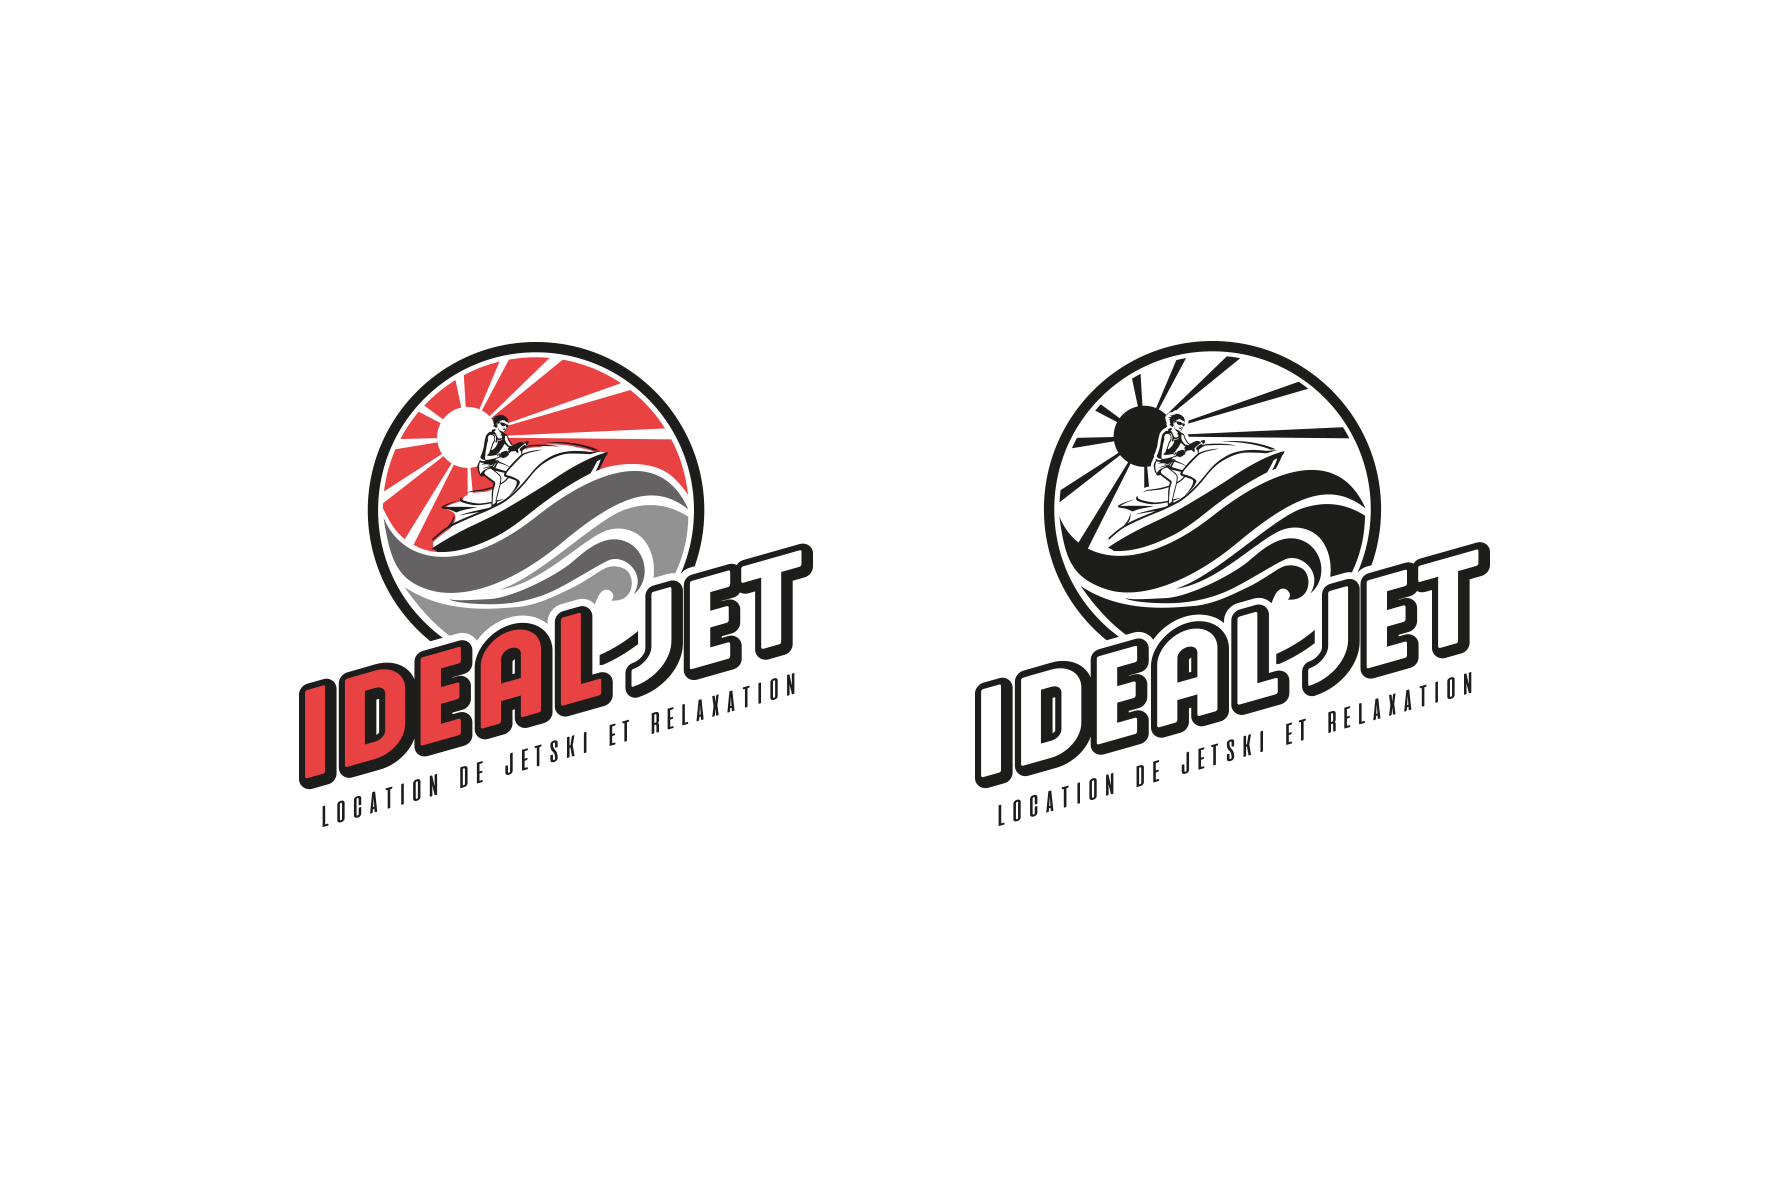 IDEAL Jet Logo 6